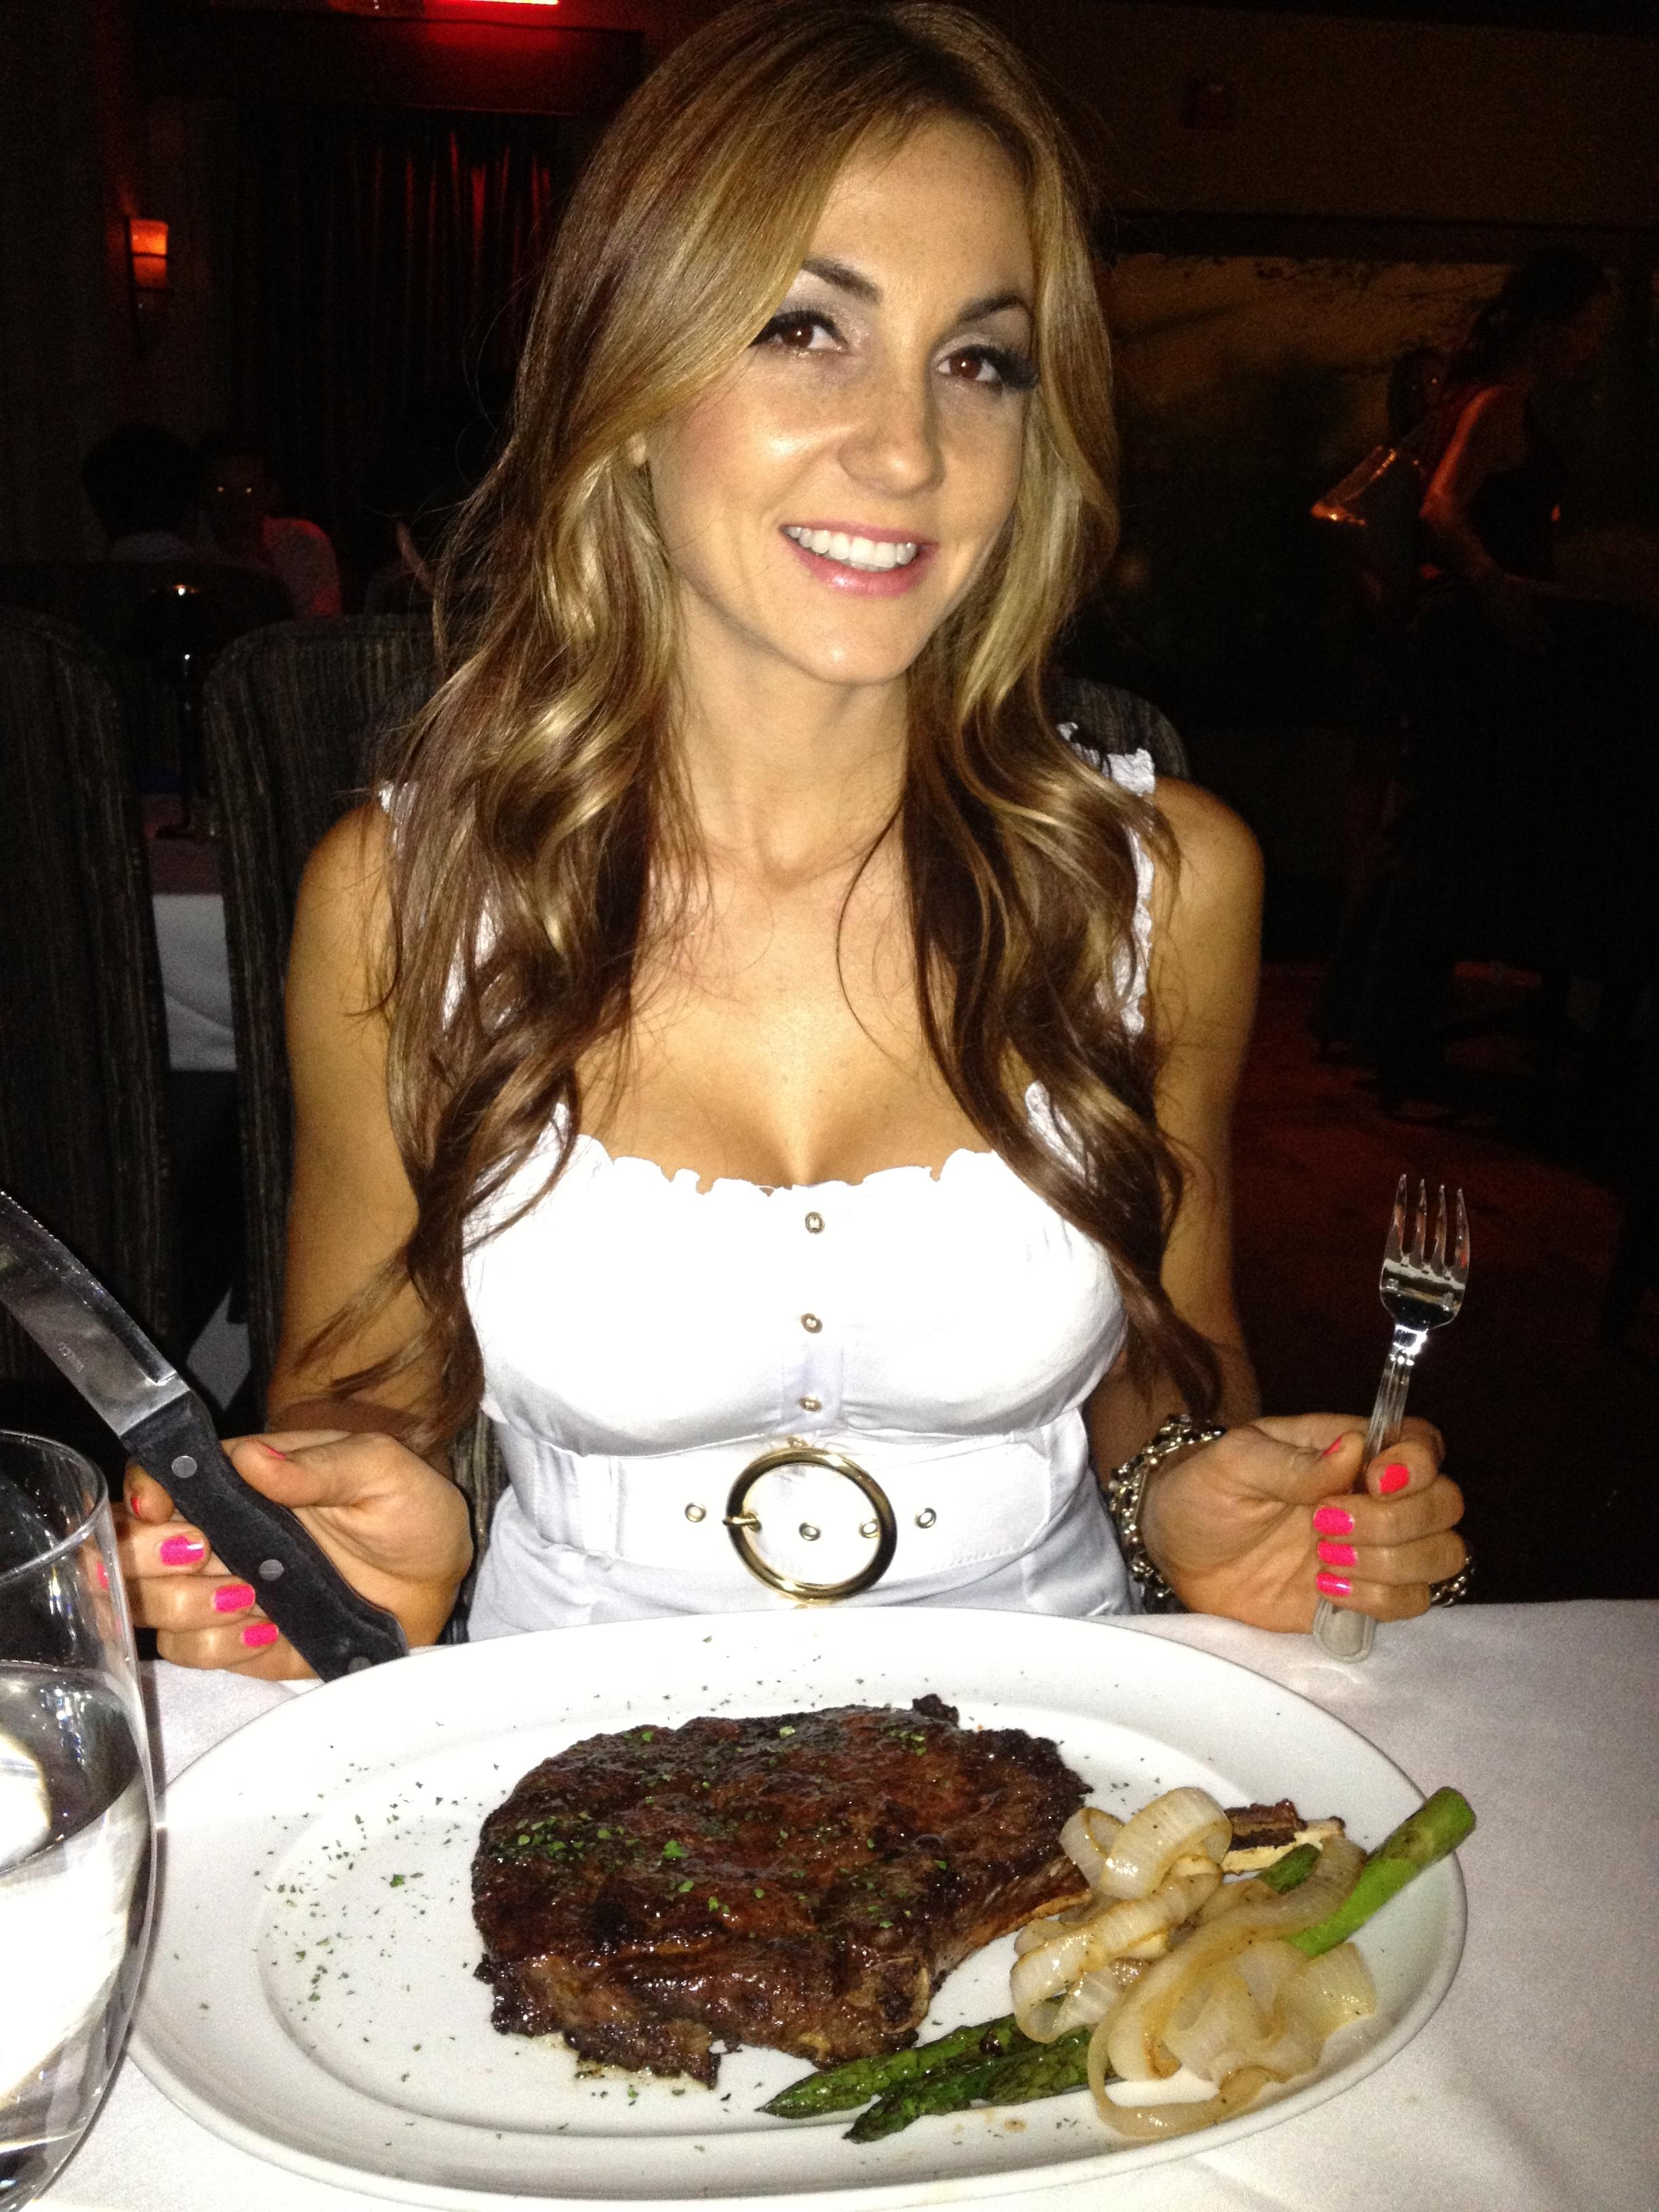 Review Of Mastro\'s Steakhouse - Costa Mesa, Orange County CA